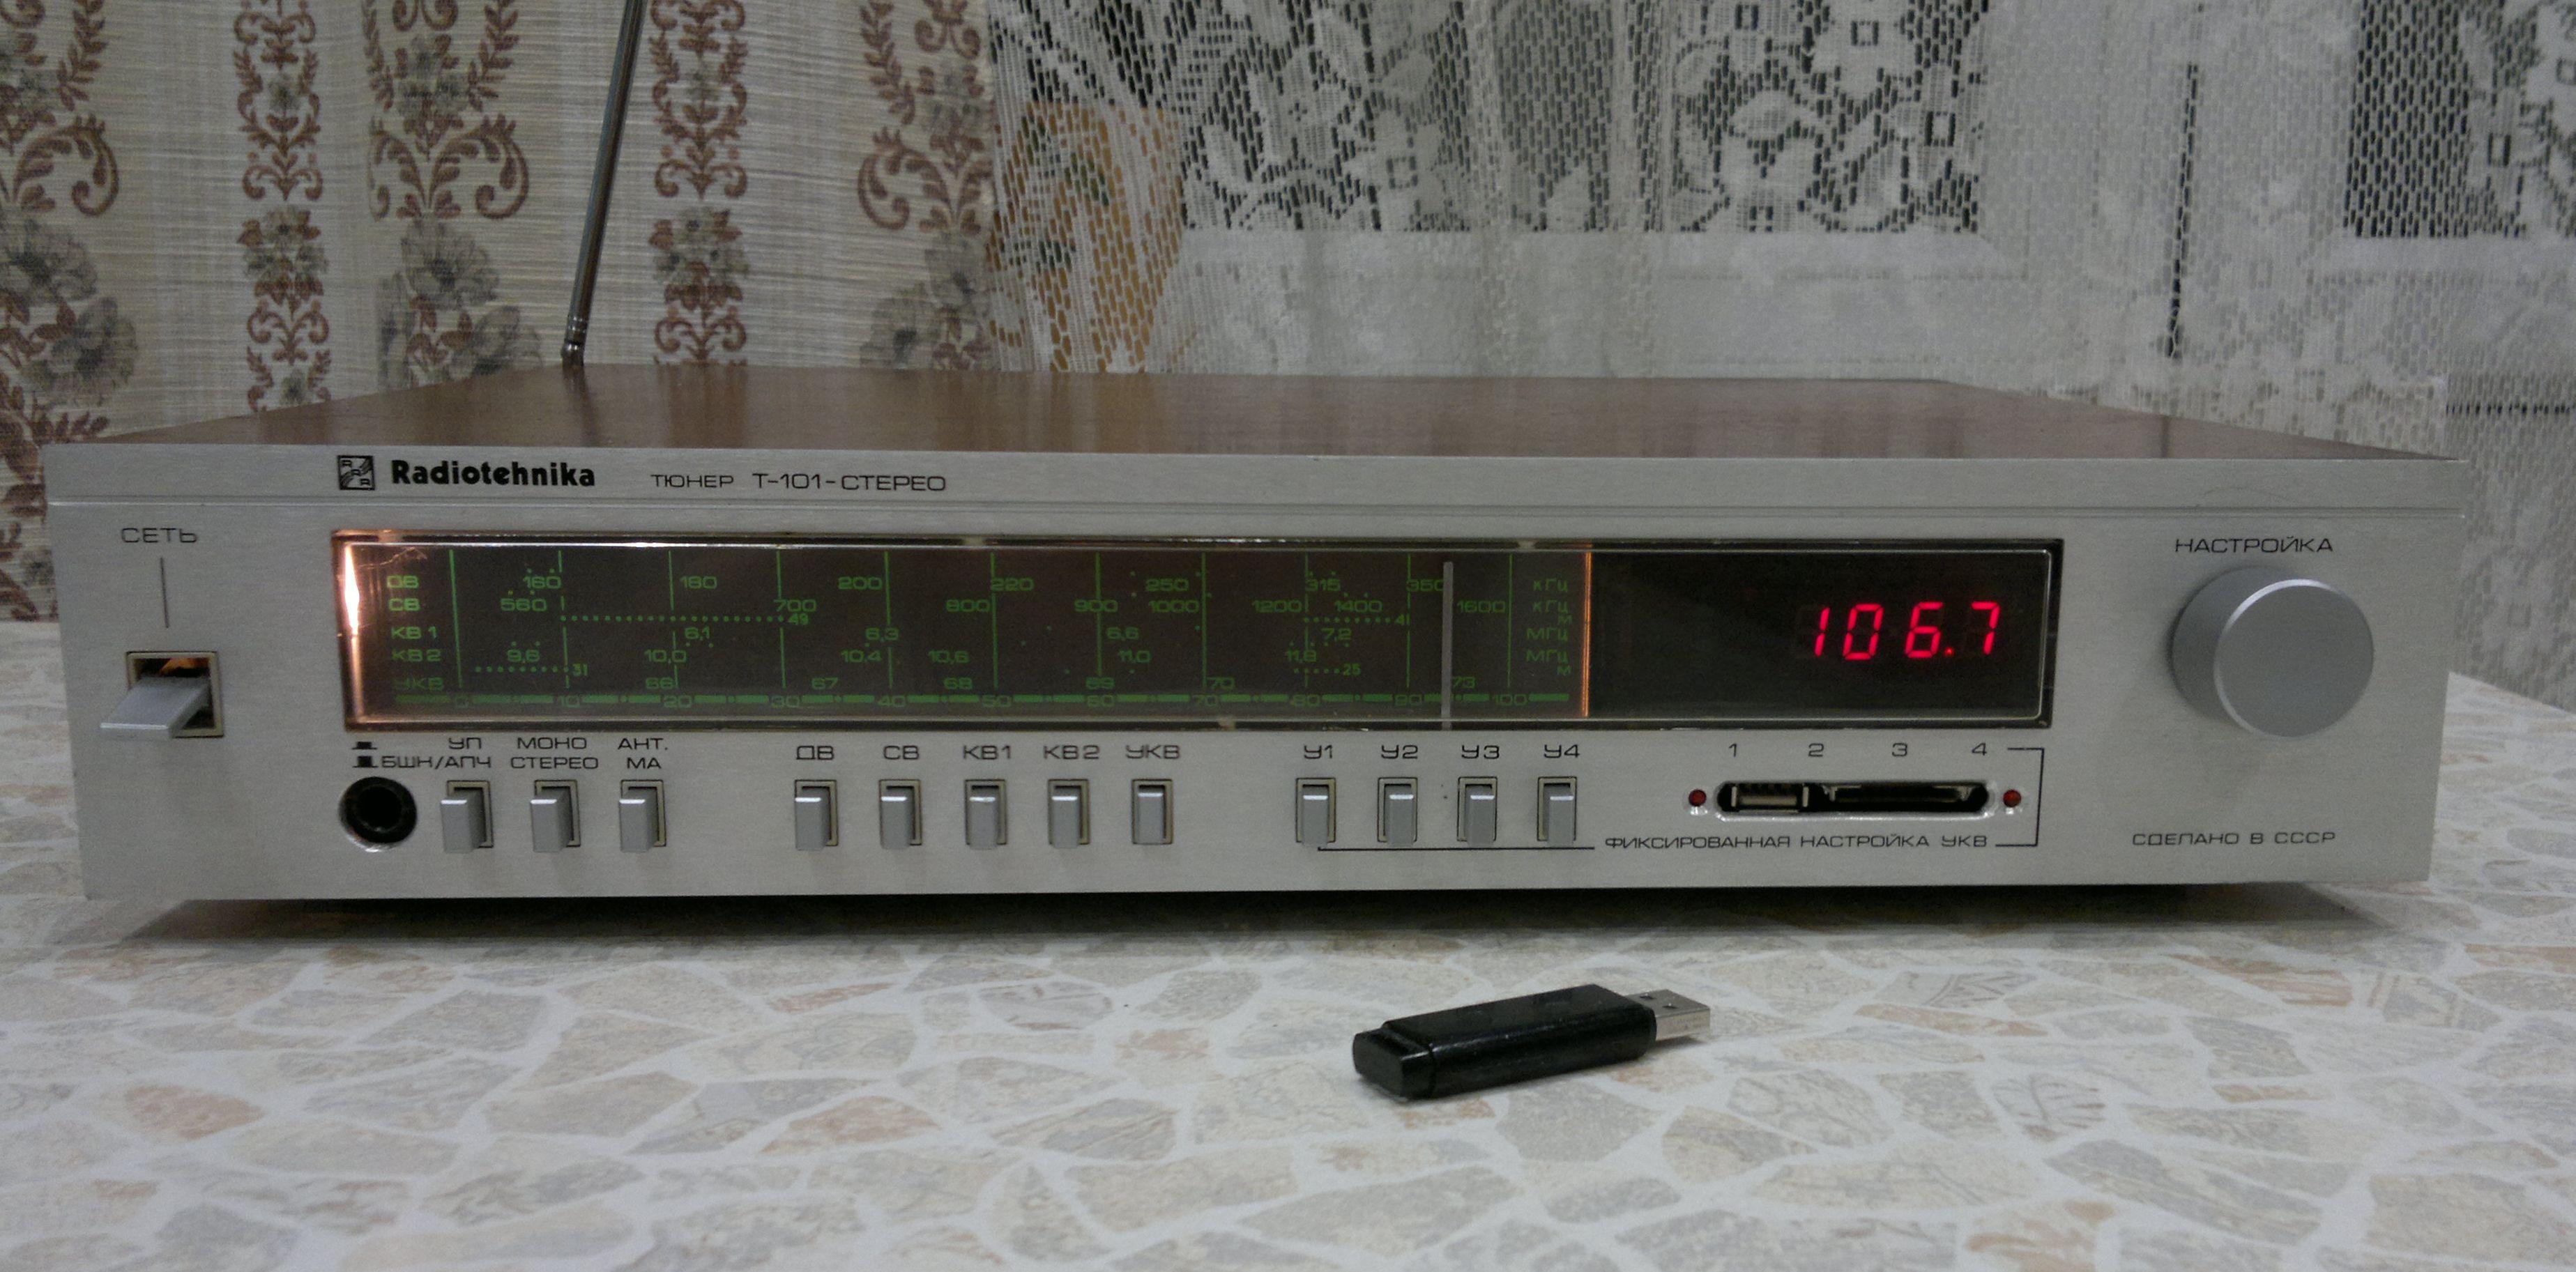 Тюнер Радиотехника Т-101 + MP2898 BT.